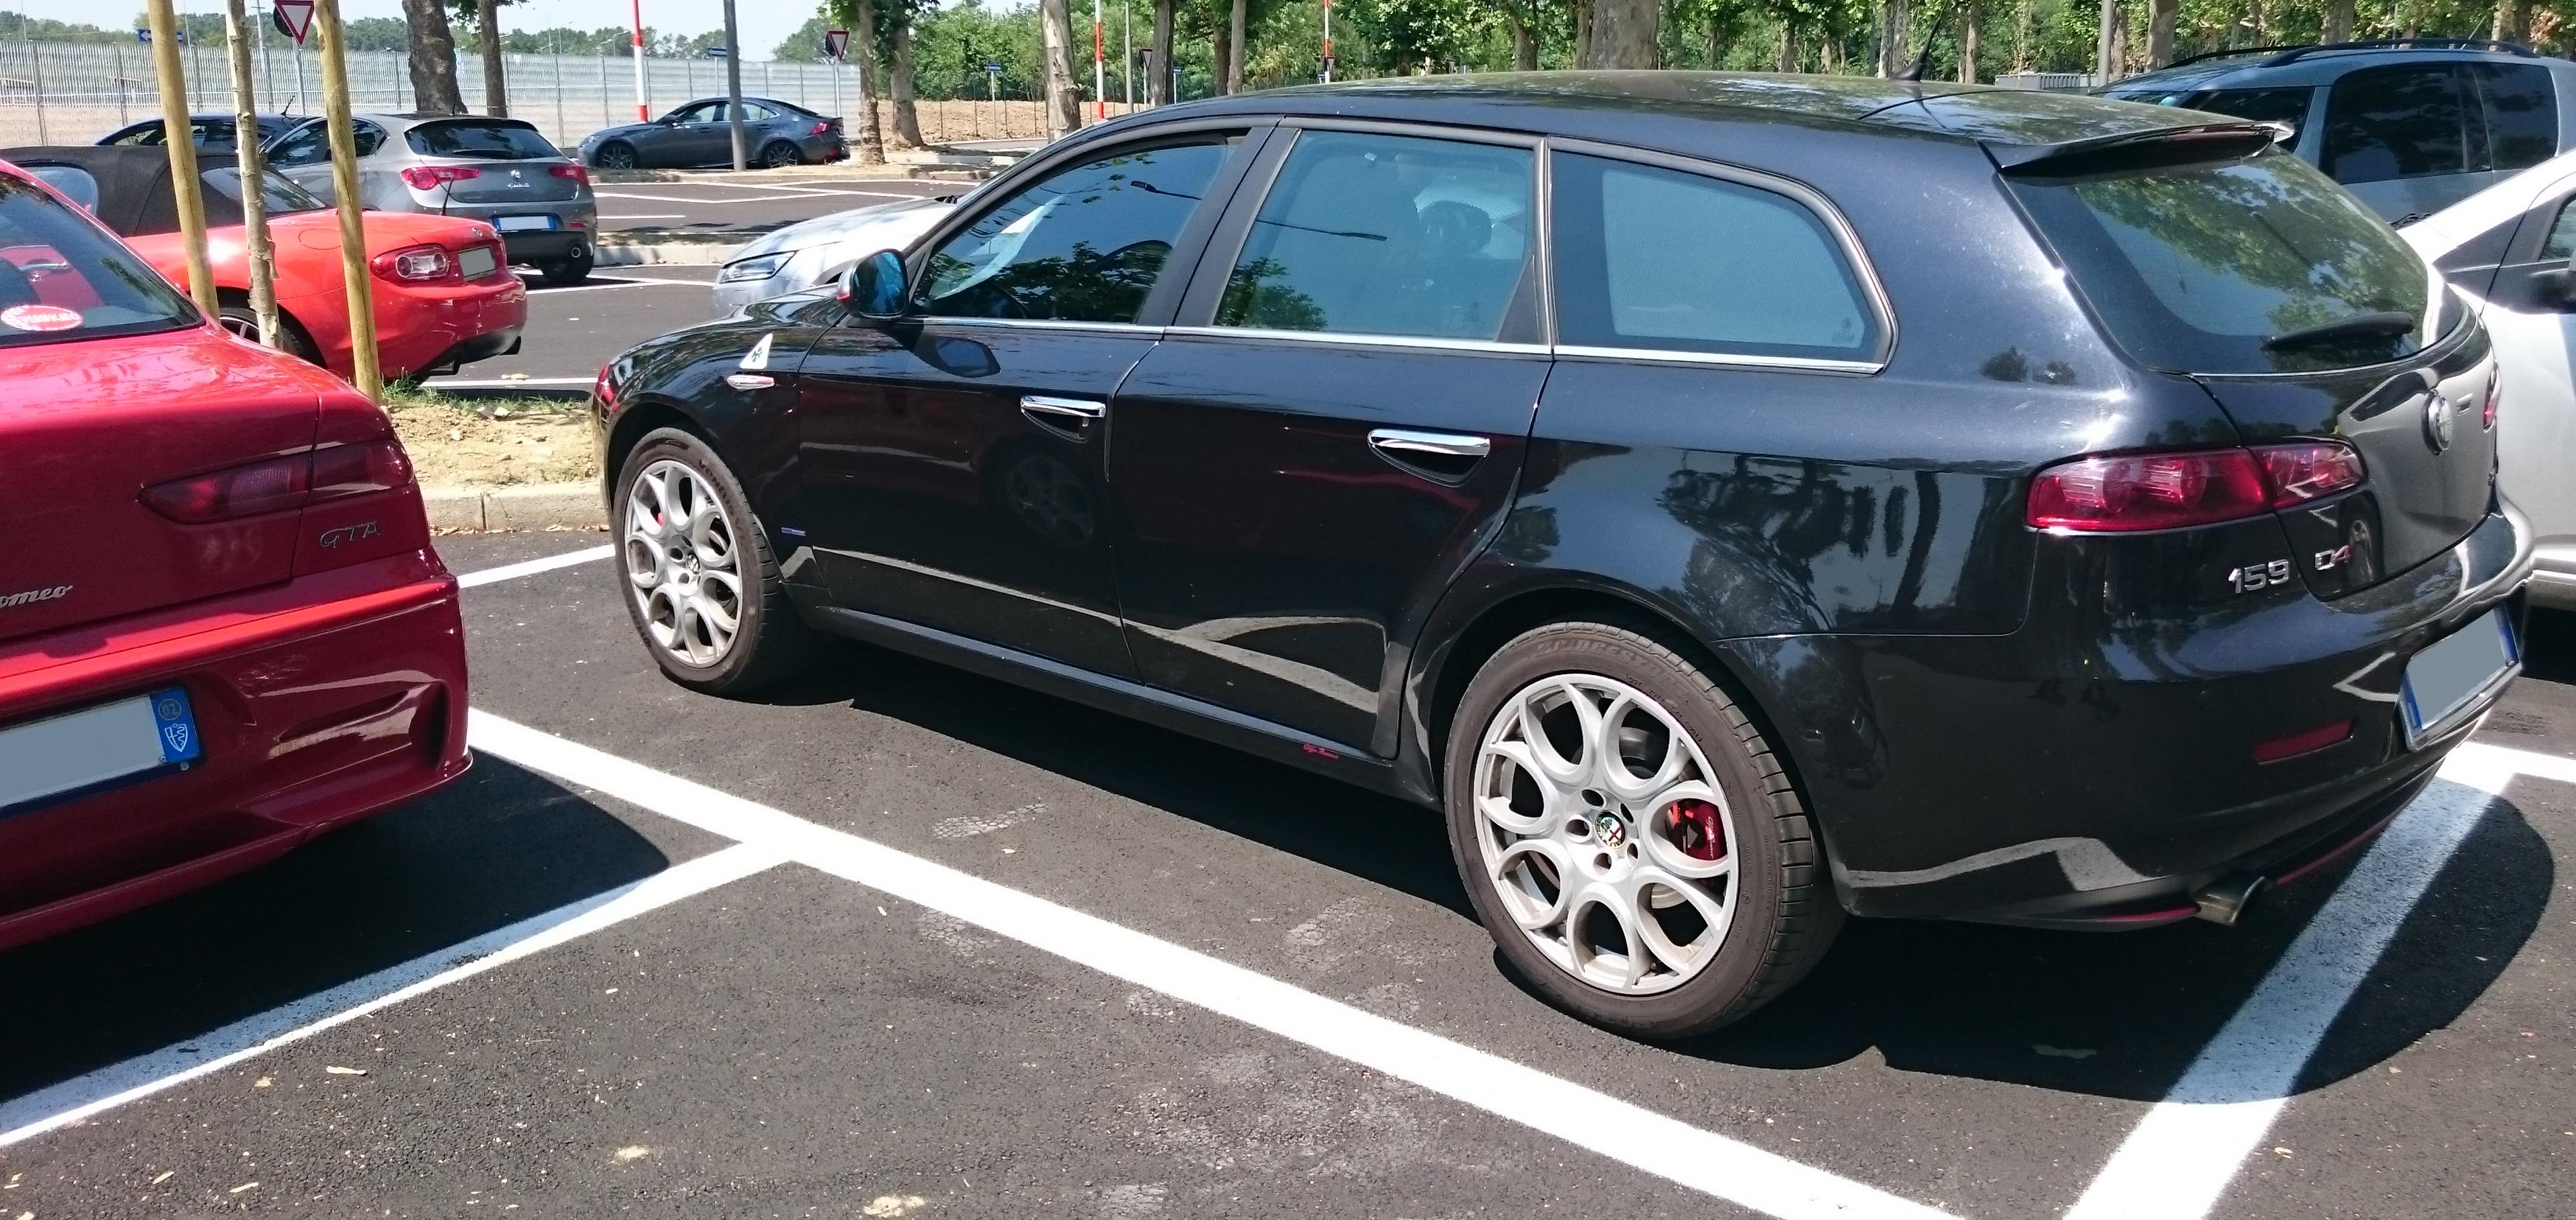 file:italy - alfa romeo 159 sportwagon station wagon out of museo